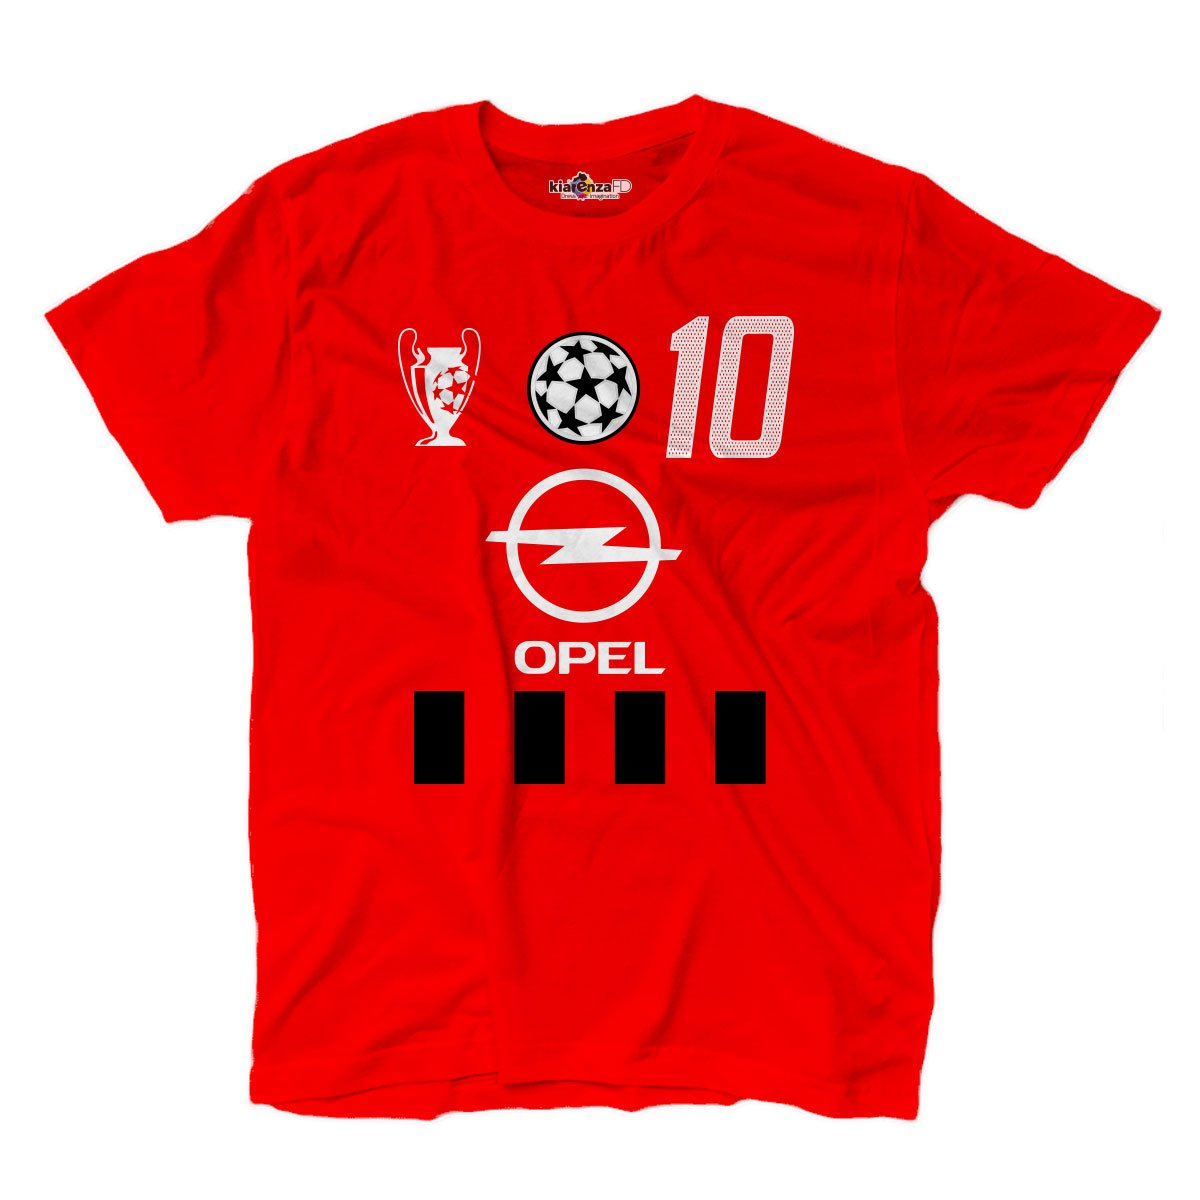 KiarenzaFD Camiseta Camiseta Fútbol Vintage Rui Milan Costa 10 ...